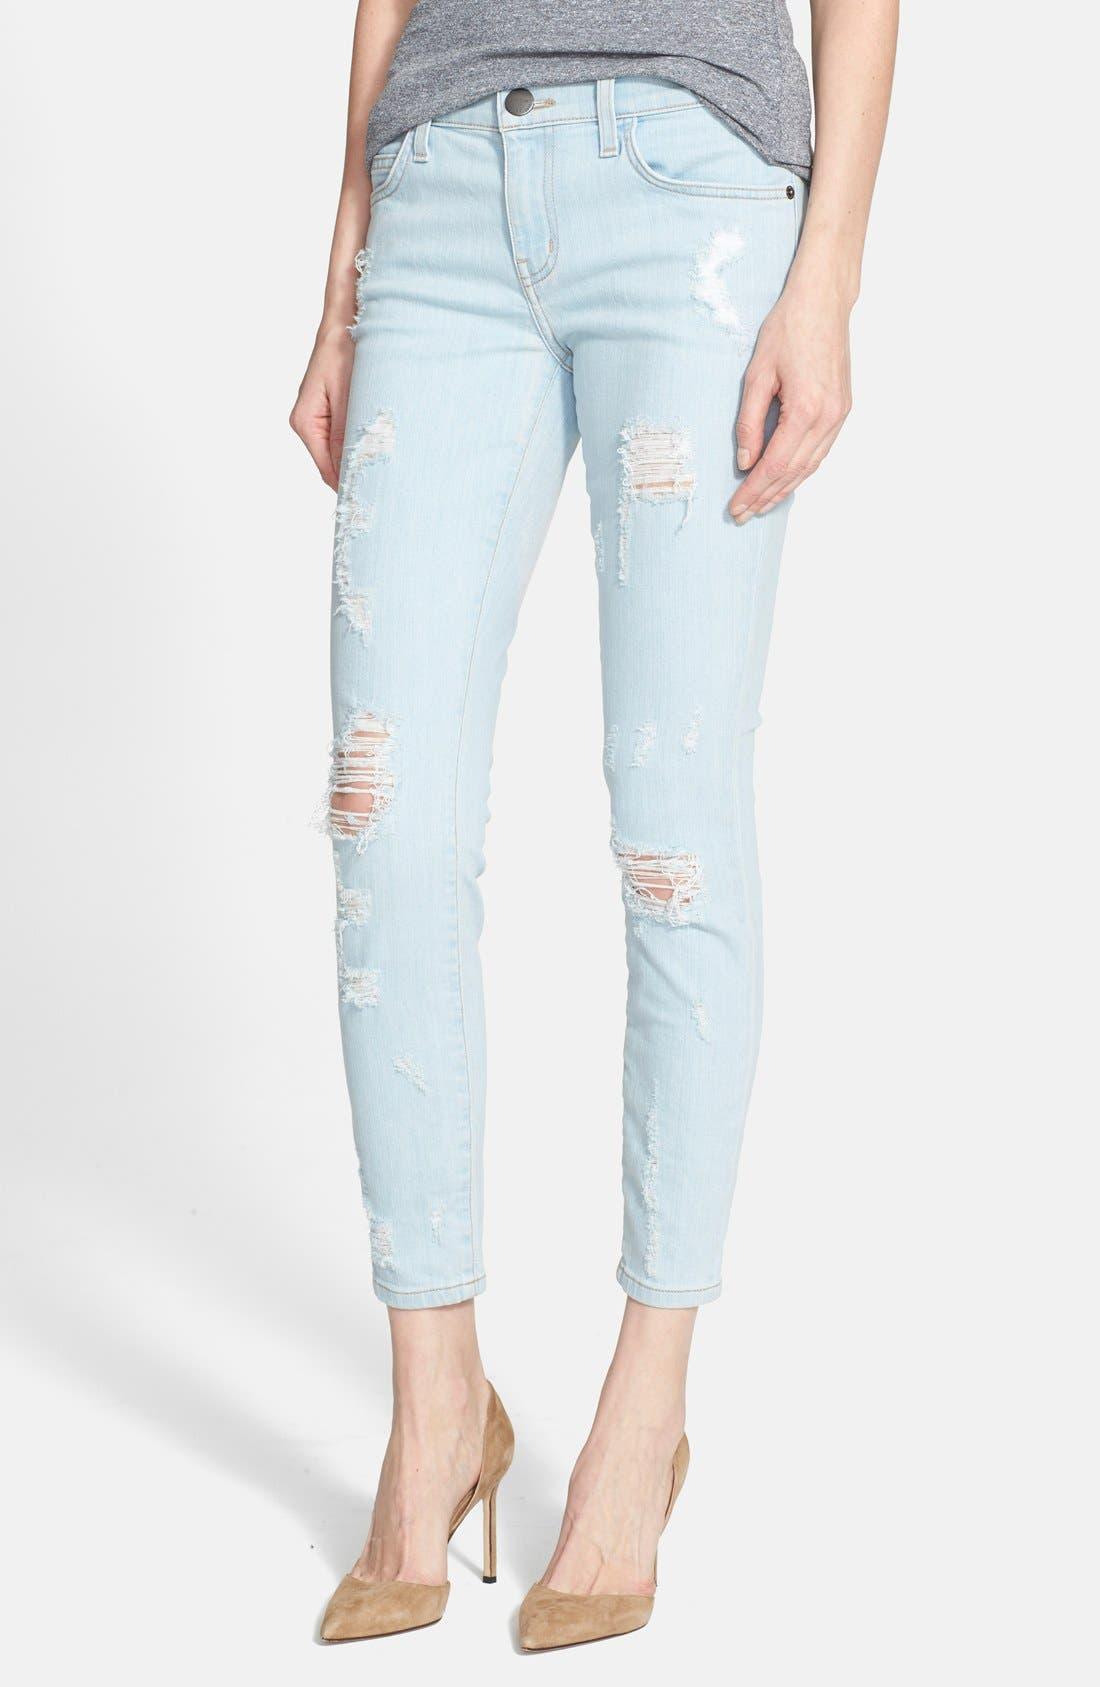 Alternate Image 1 Selected - Current/Elliott 'The Stiletto' Destroyed Skinny Jeans (Chalky Indigo Shredded)